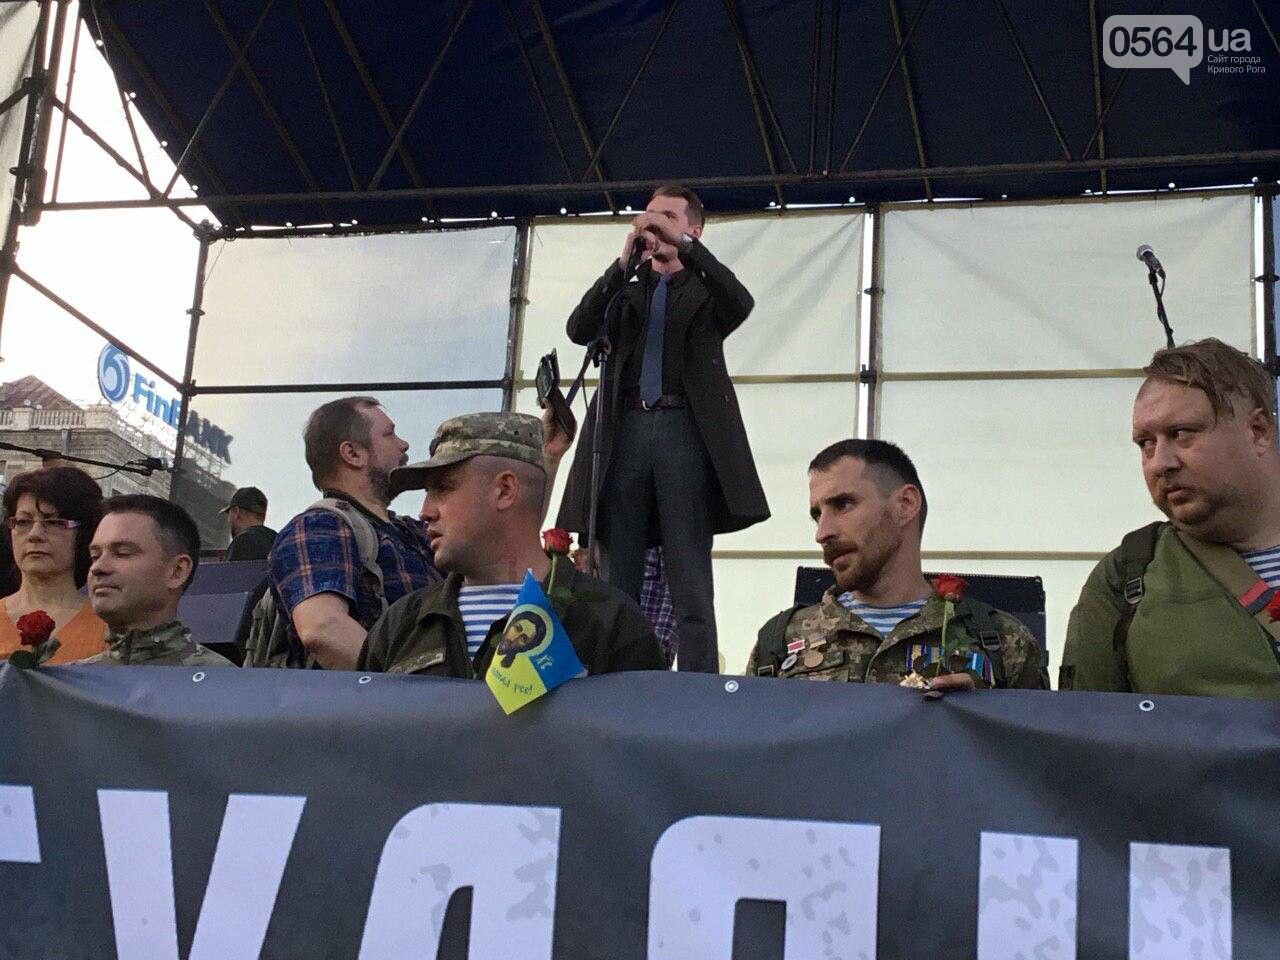 Криворожане поддержали Марш сопротивления капитуляции в Киеве, - ФОТО, ВИДЕО, ОБНОВЛЕНО, фото-40